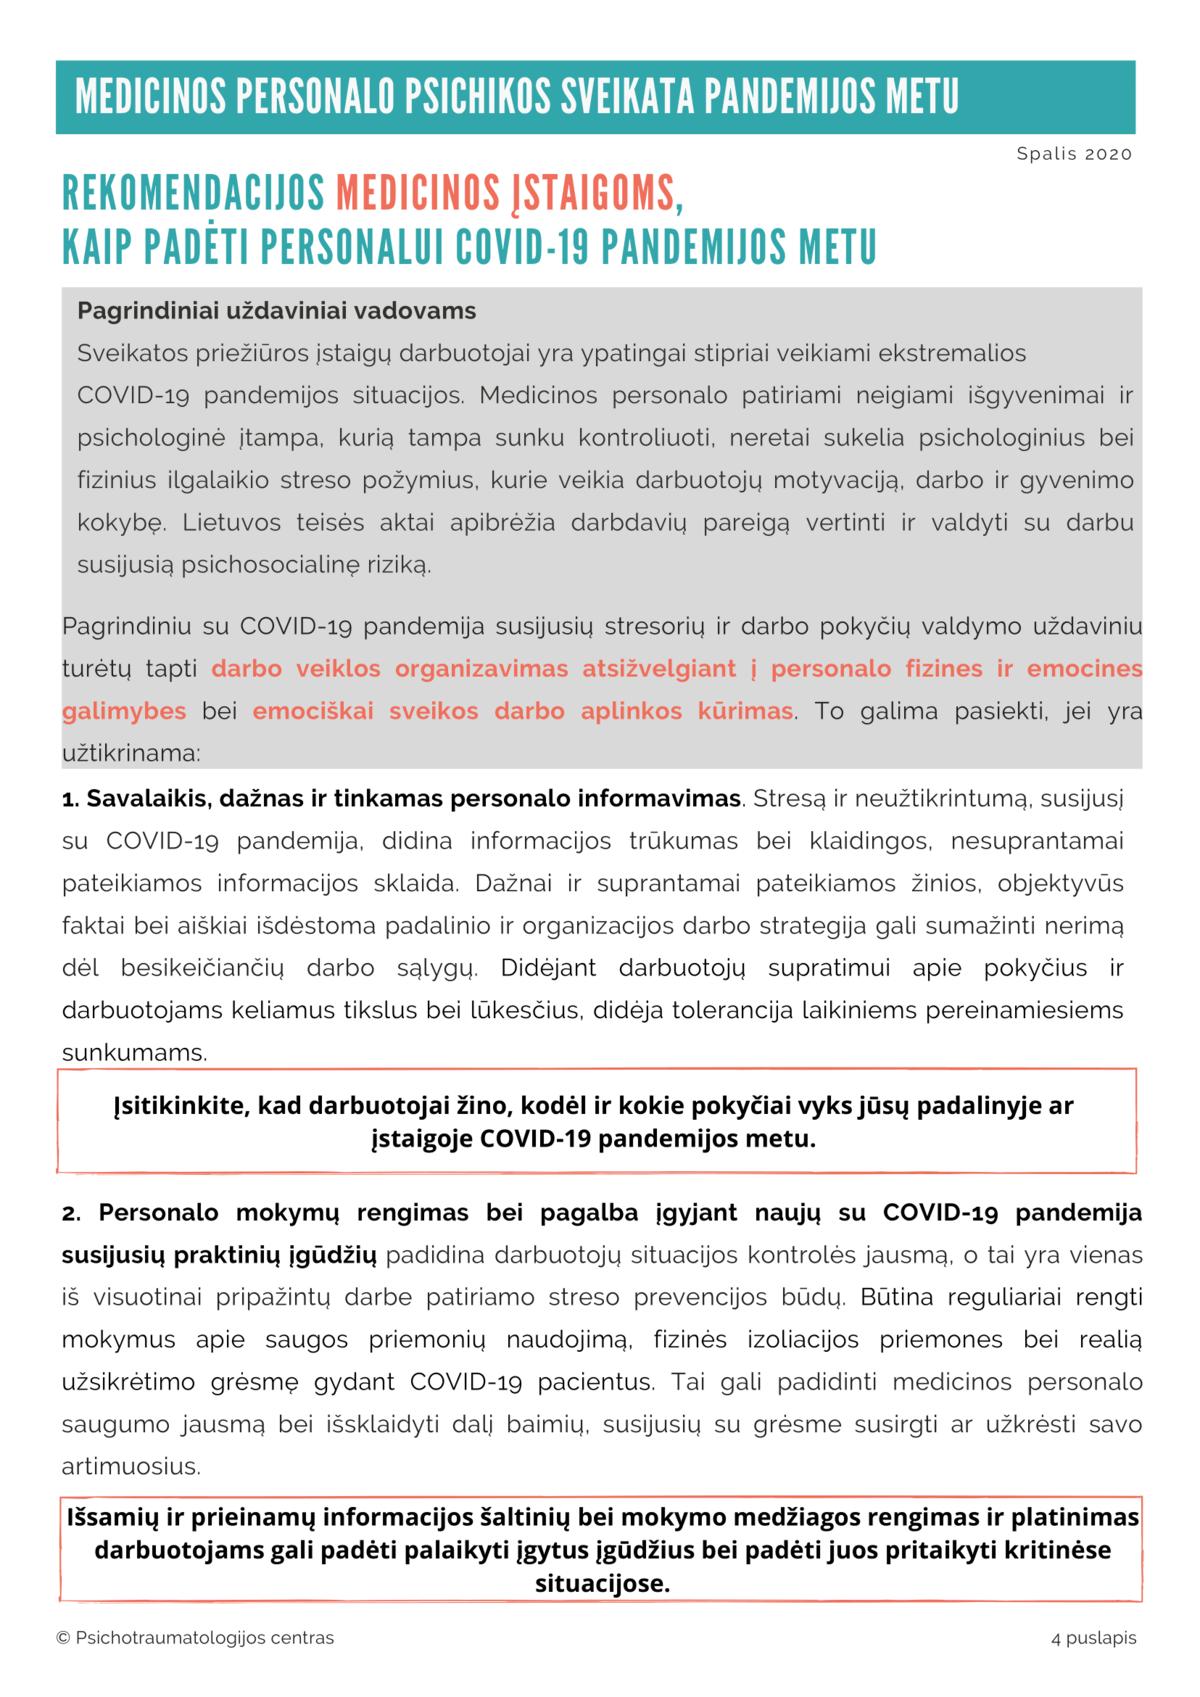 Rekomendacijos medikams (1)-4